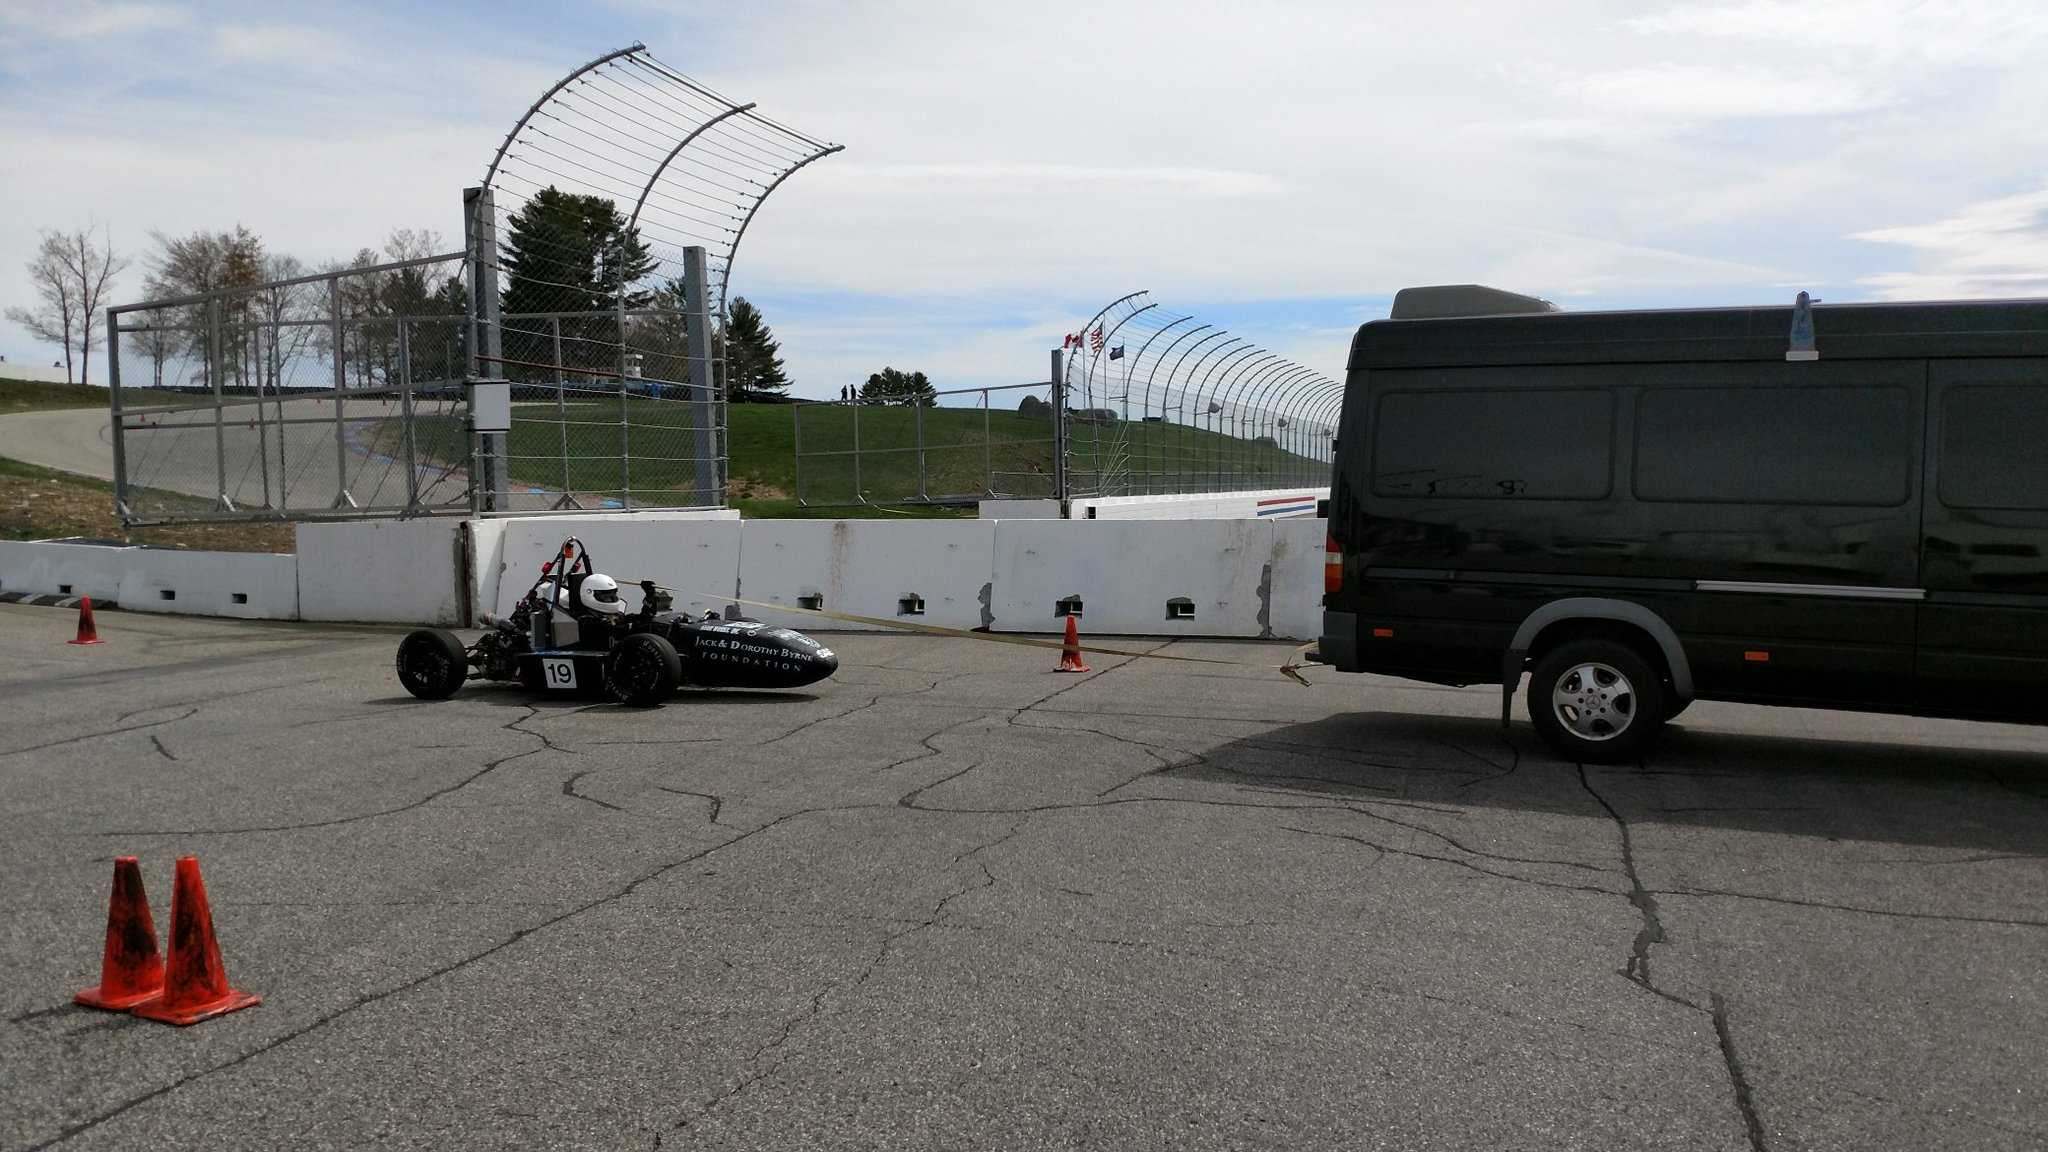 Dartmouth back to the garage. @Formula_Hybrid @Synchronoss @thayerschool https://t.co/4nfnKDRwlr